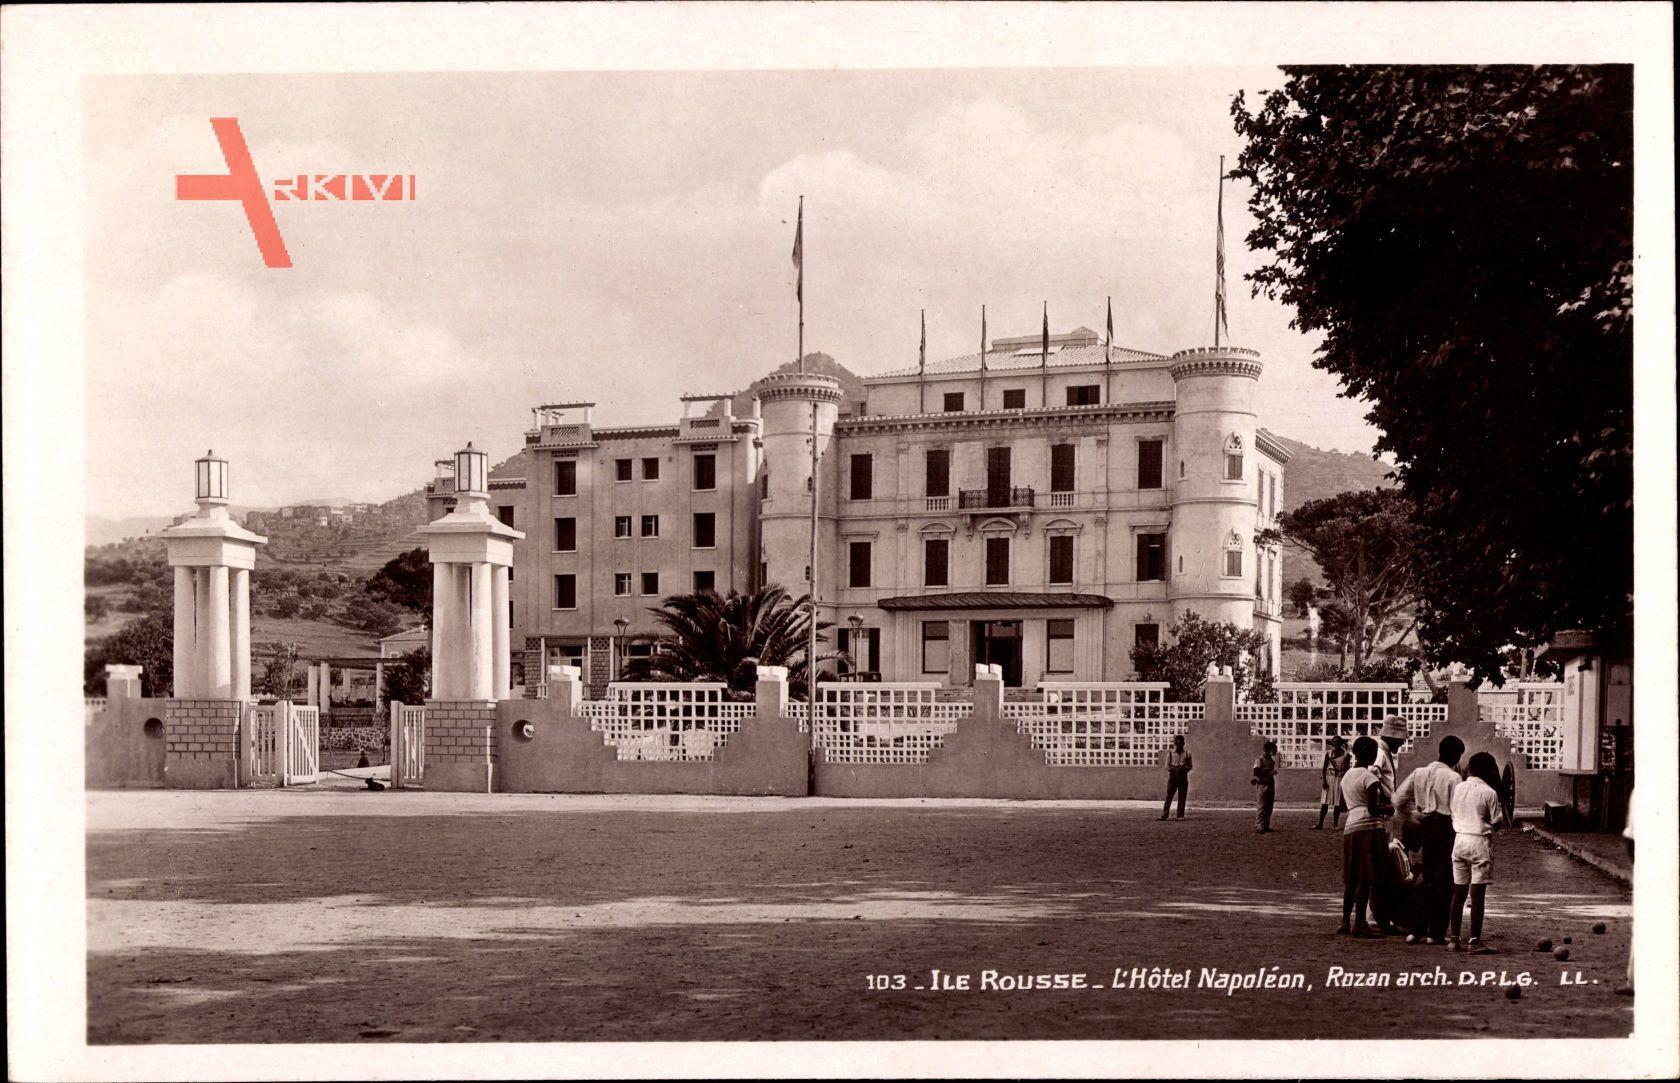 Ile Rousse Haute Corse, Straßenpartie mit Blick auf Hotel Napoléon